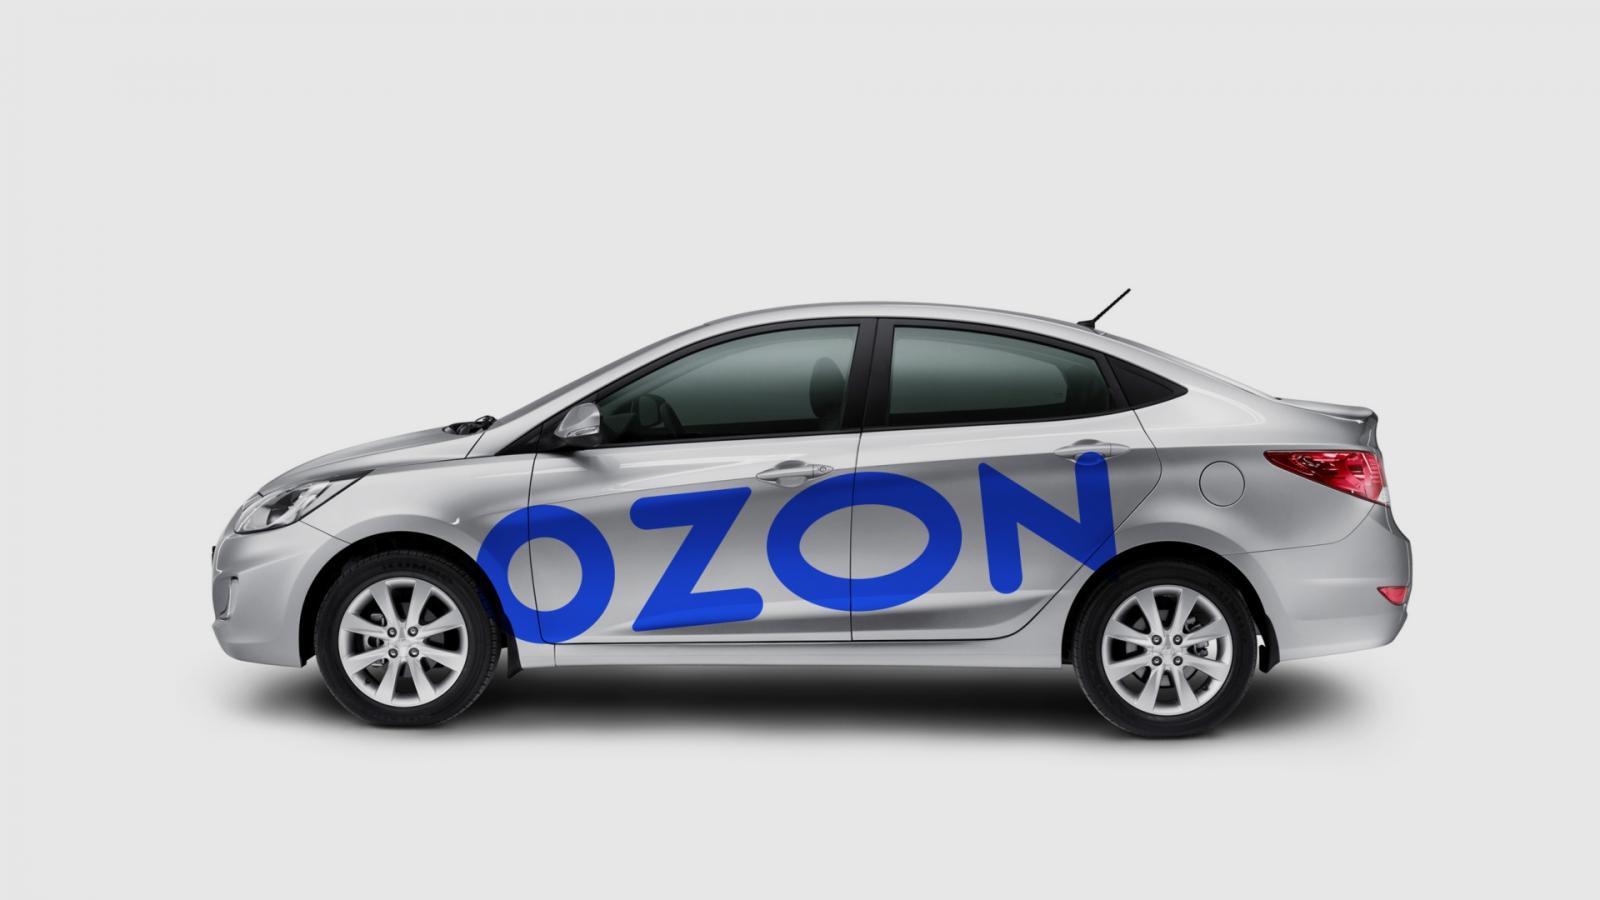 «Автомир» и Ozon запускают онлайн-продажи машин